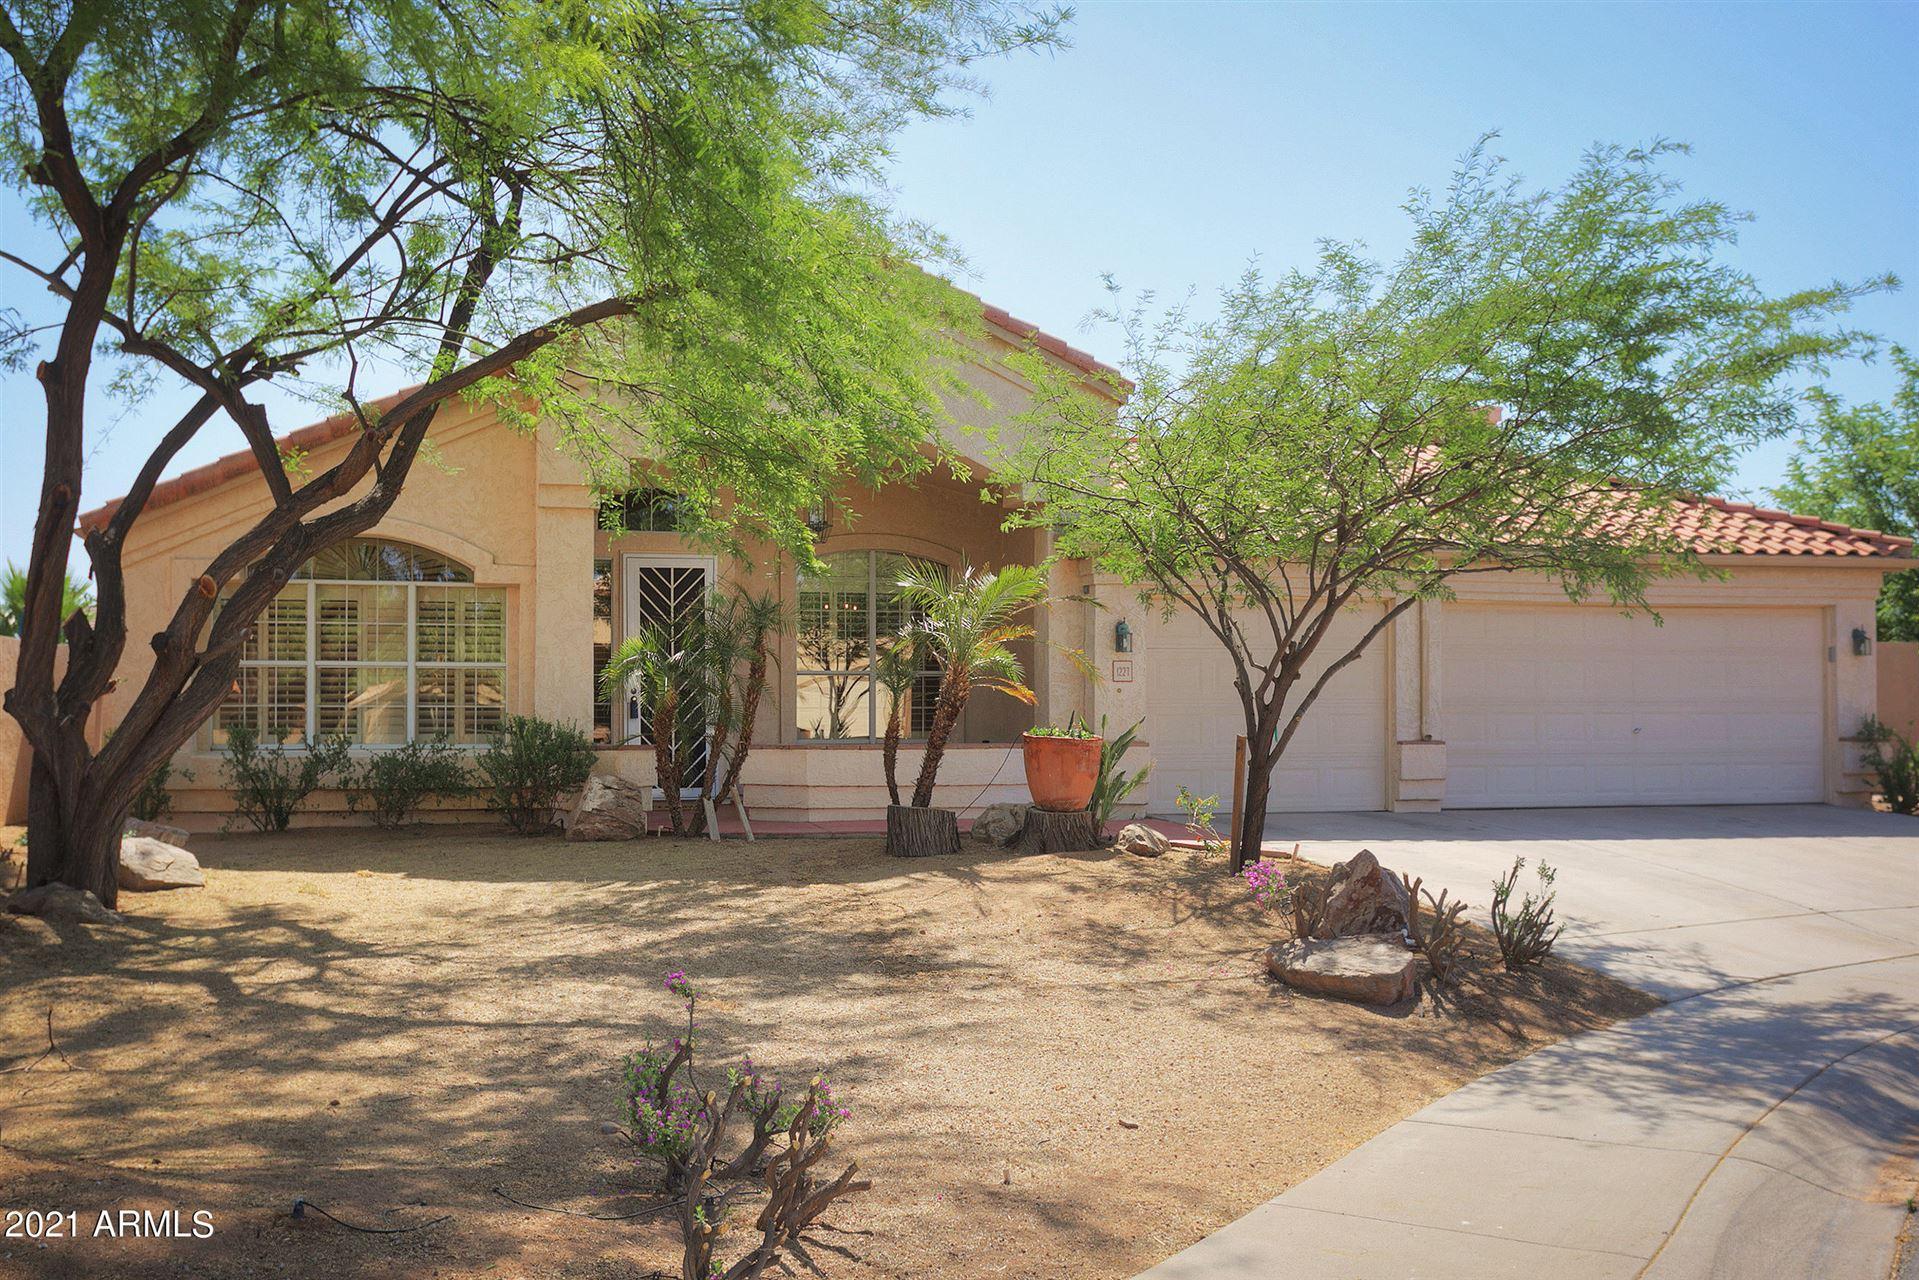 Photo of 1227 S Longmore Court, Chandler, AZ 85248 (MLS # 6234339)